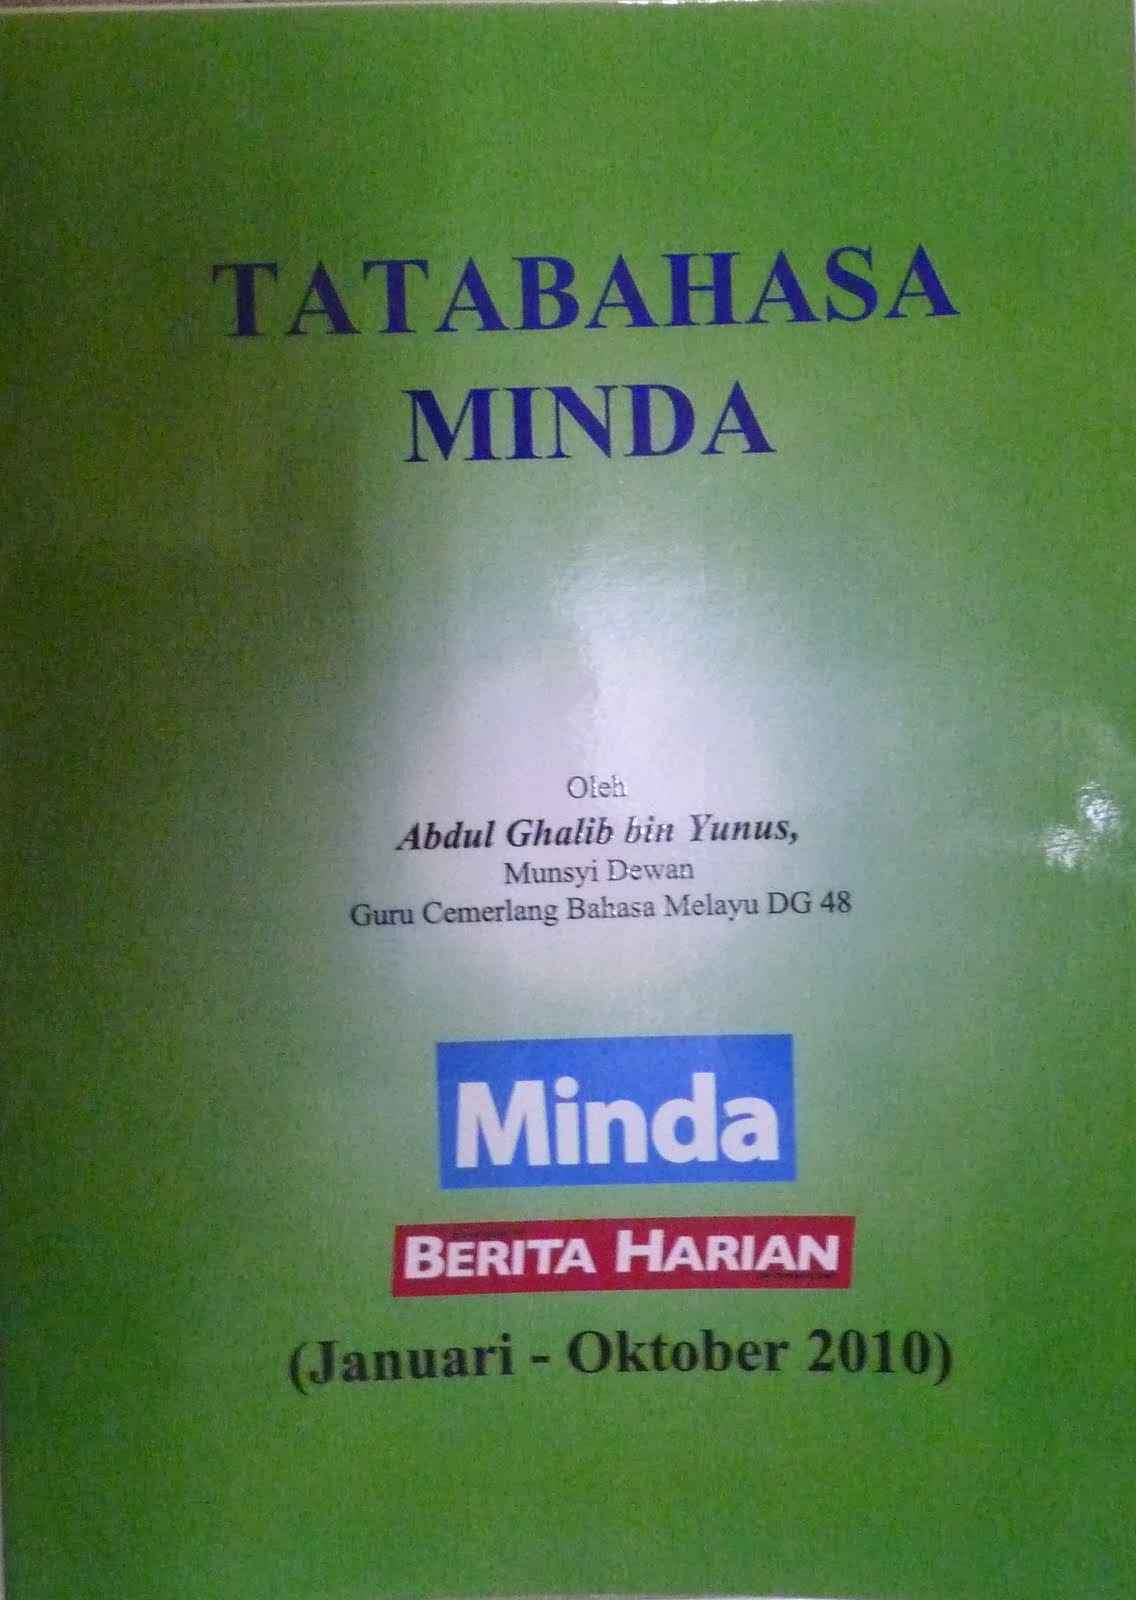 Buku `Tatabahasa Minda' (2010)